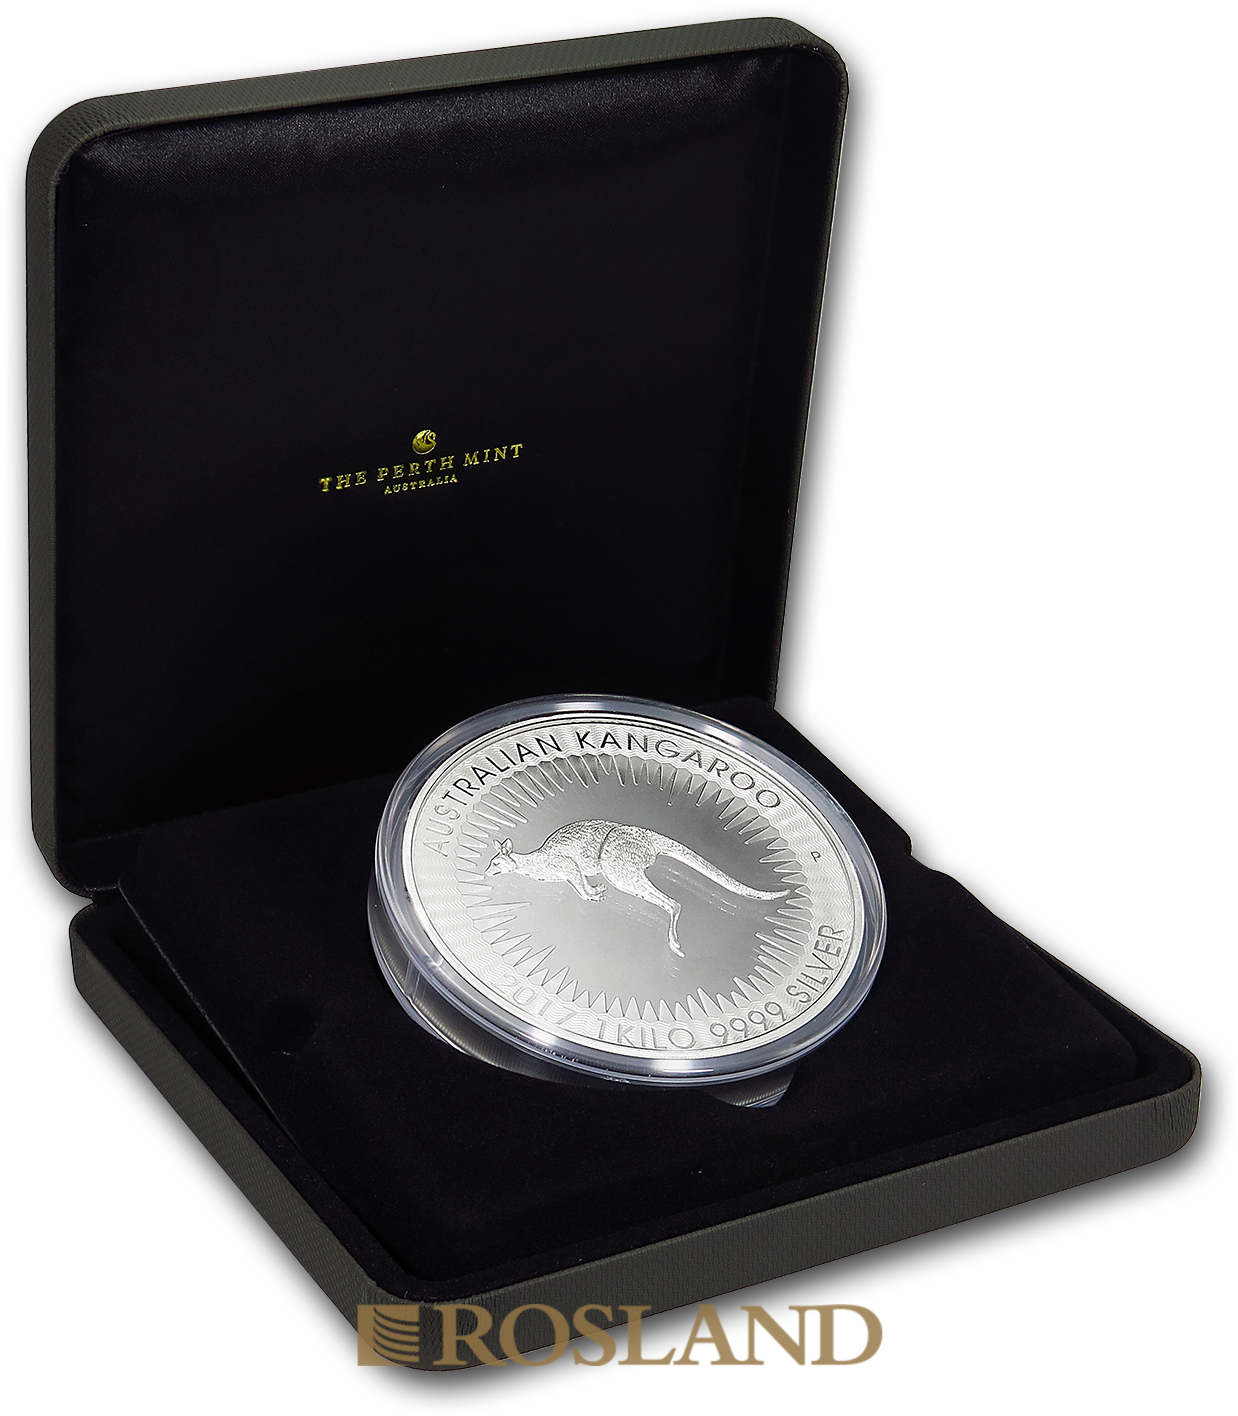 1 Kilogramm Silbermünze Australien Känguru 2017 PP (Box, Zertifikat)